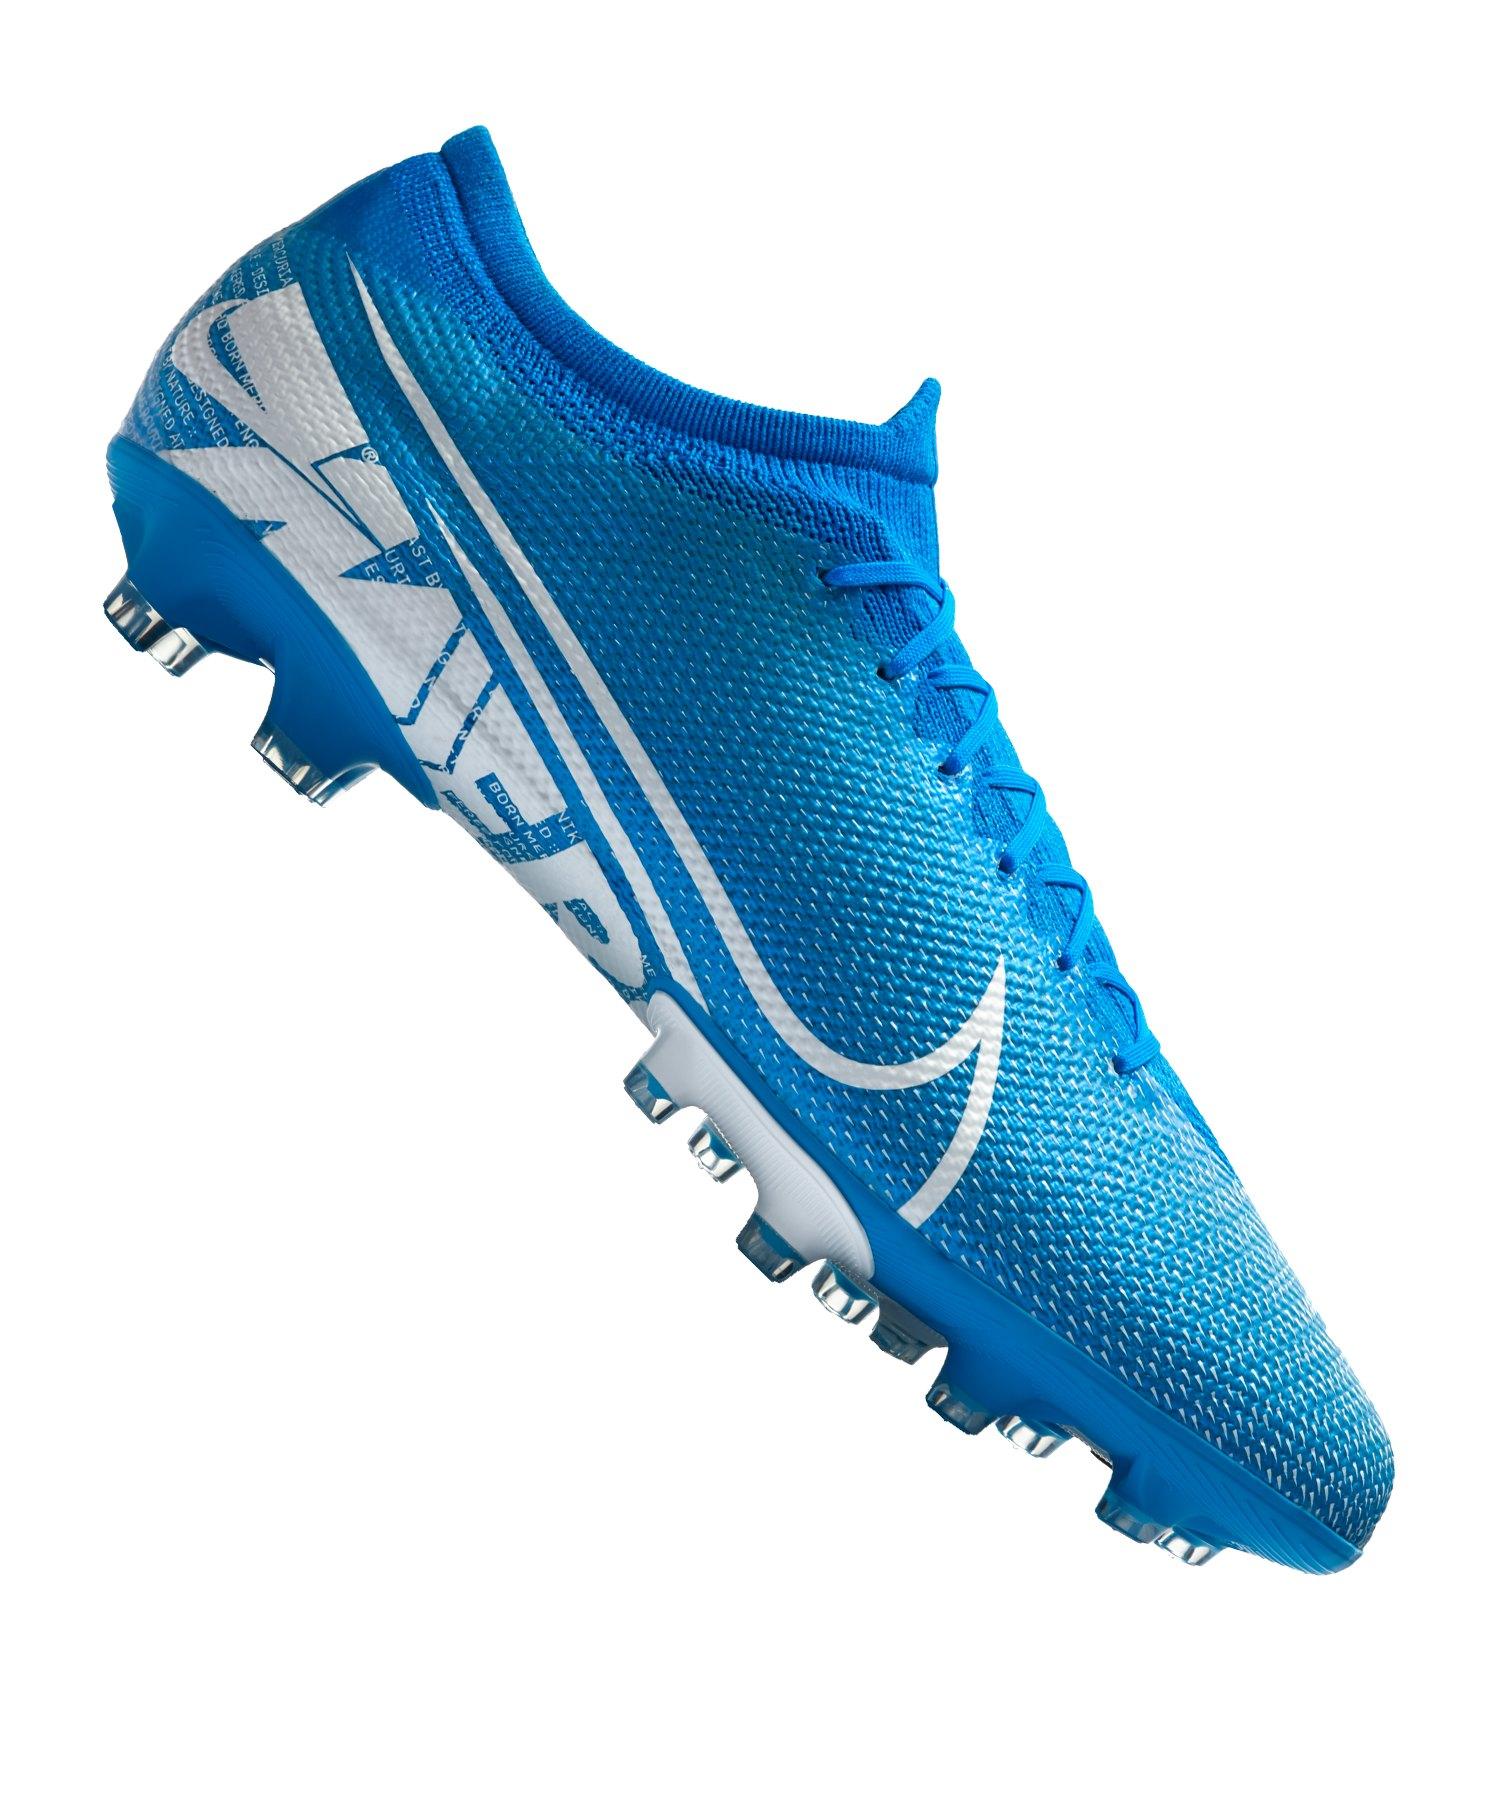 Nike Mercurial Vapor XIII Pro AG-Pro Blau F414 - blau